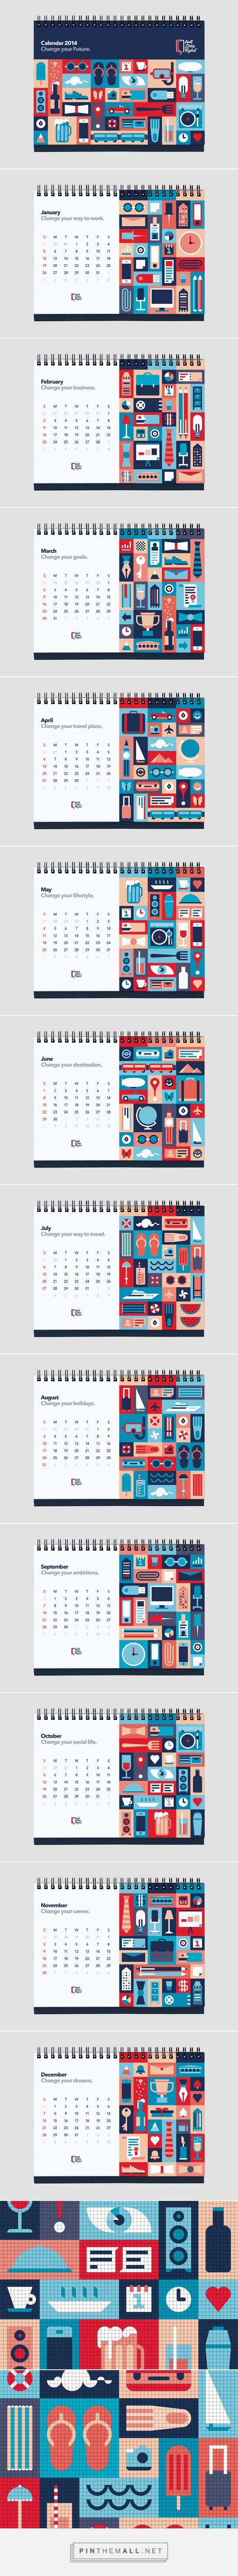 wall street english calendar 2014 calendar design on wall street english id=99725